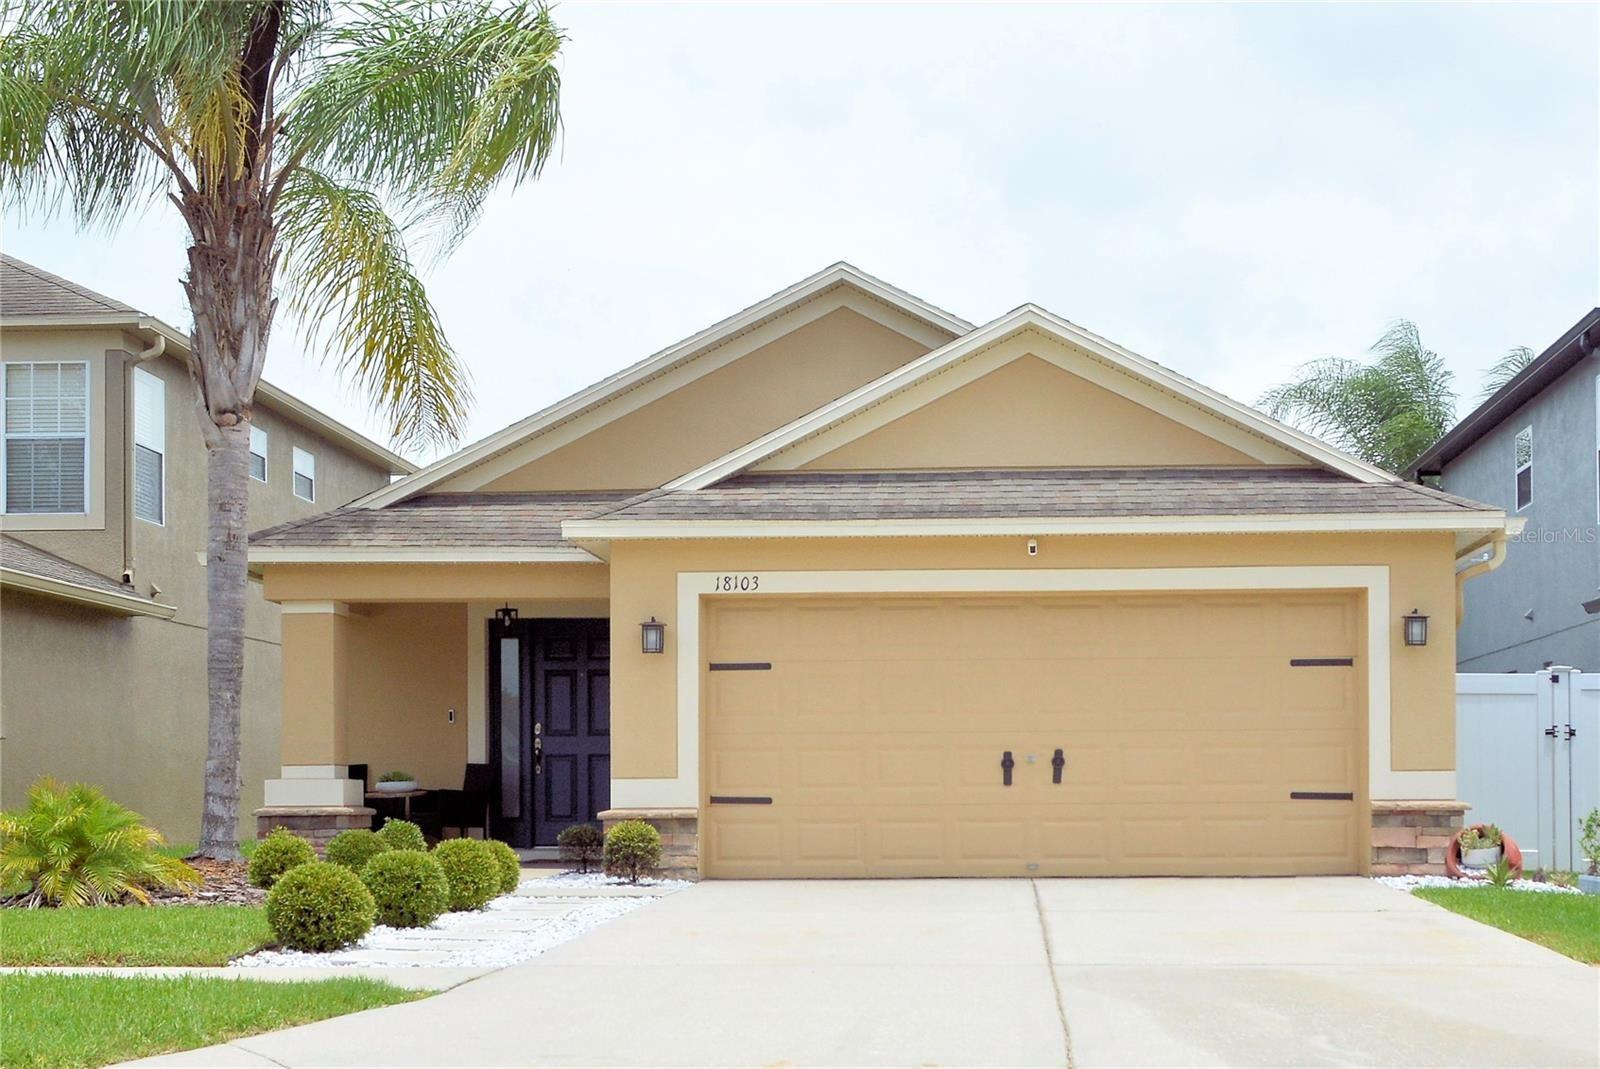 18103 GLASTONBURY LANE, Land O Lakes, FL 34638 - MLS#: U8129450